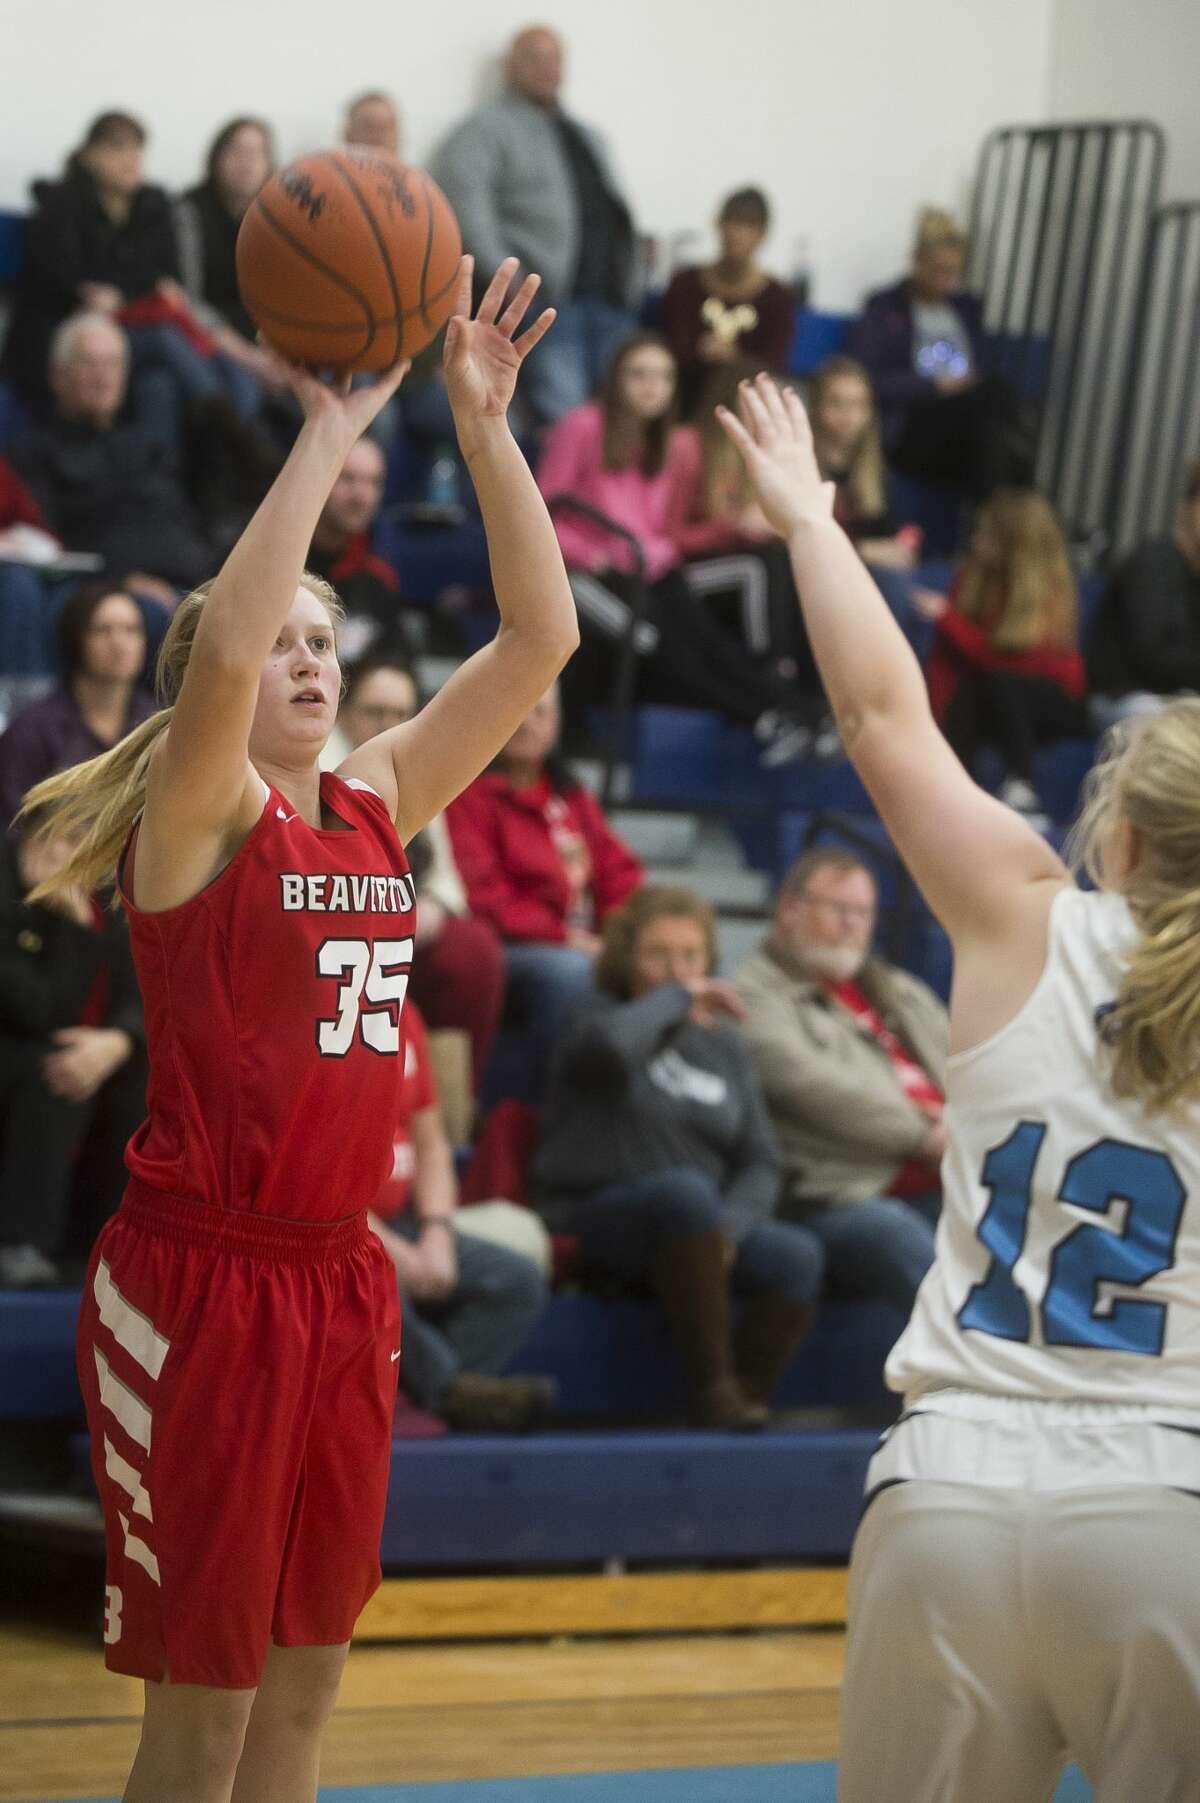 Beaverton senior Maddy Krauss takes a shot during the Beavers' game against Meridian on Friday, Jan. 5, 2018 at Meridian High School. (Katy Kildee/kkildee@mdn.net)